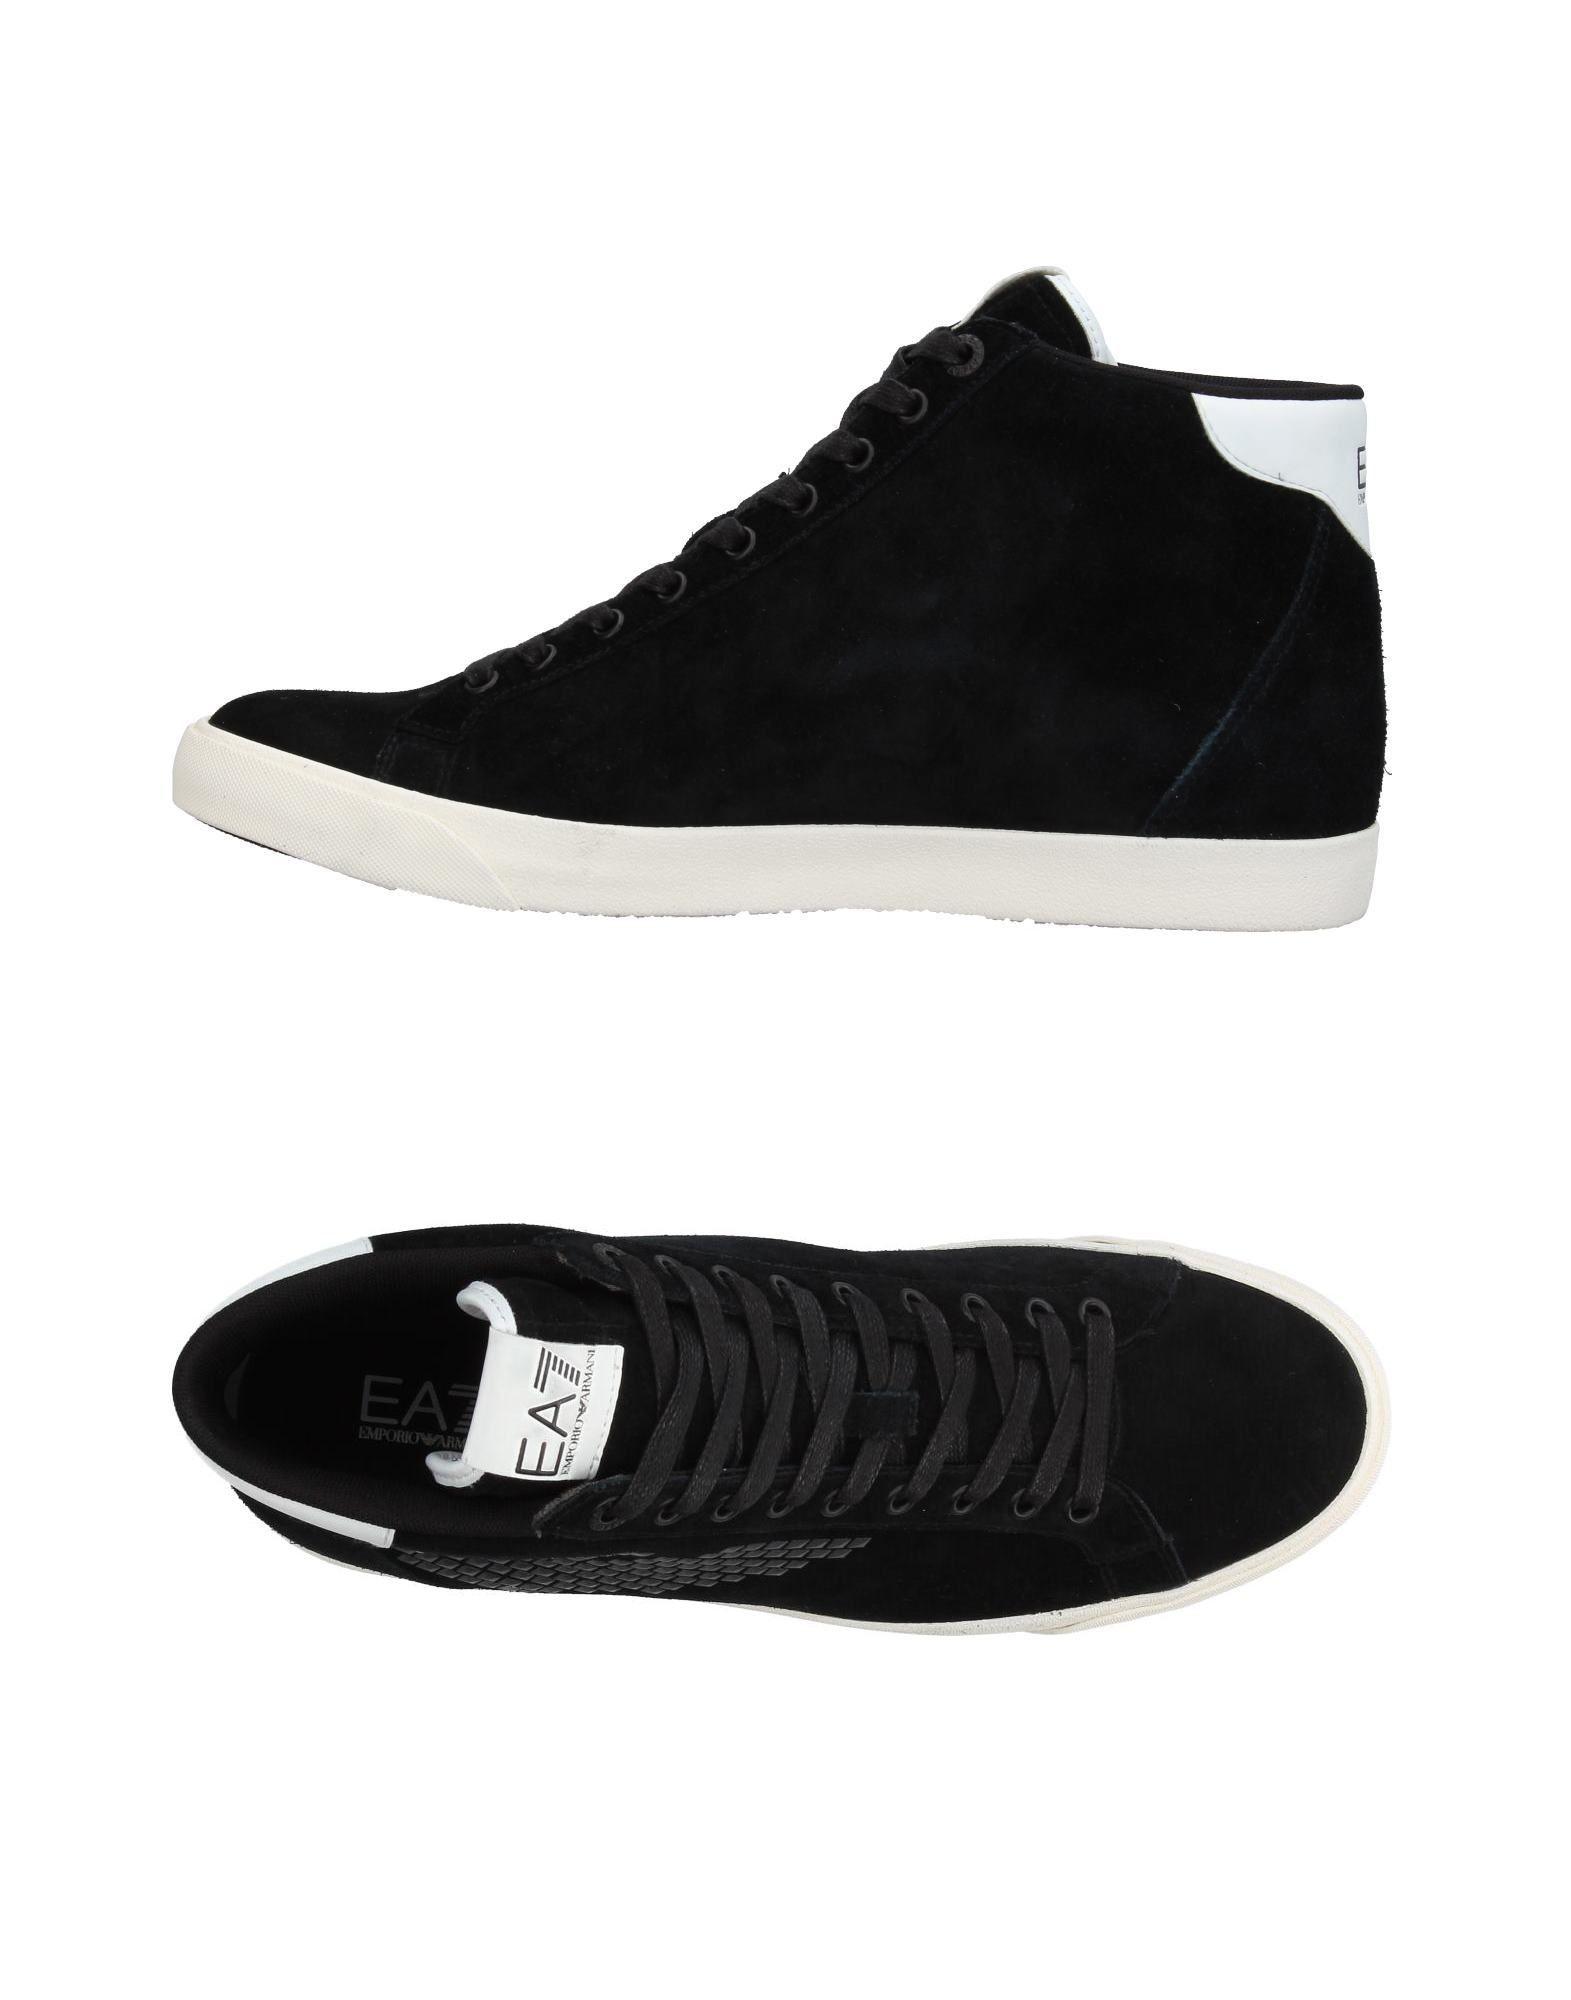 EA7 Herren High Sneakers & Tennisschuhe Farbe Schwarz Größe 13 jetztbilligerkaufen